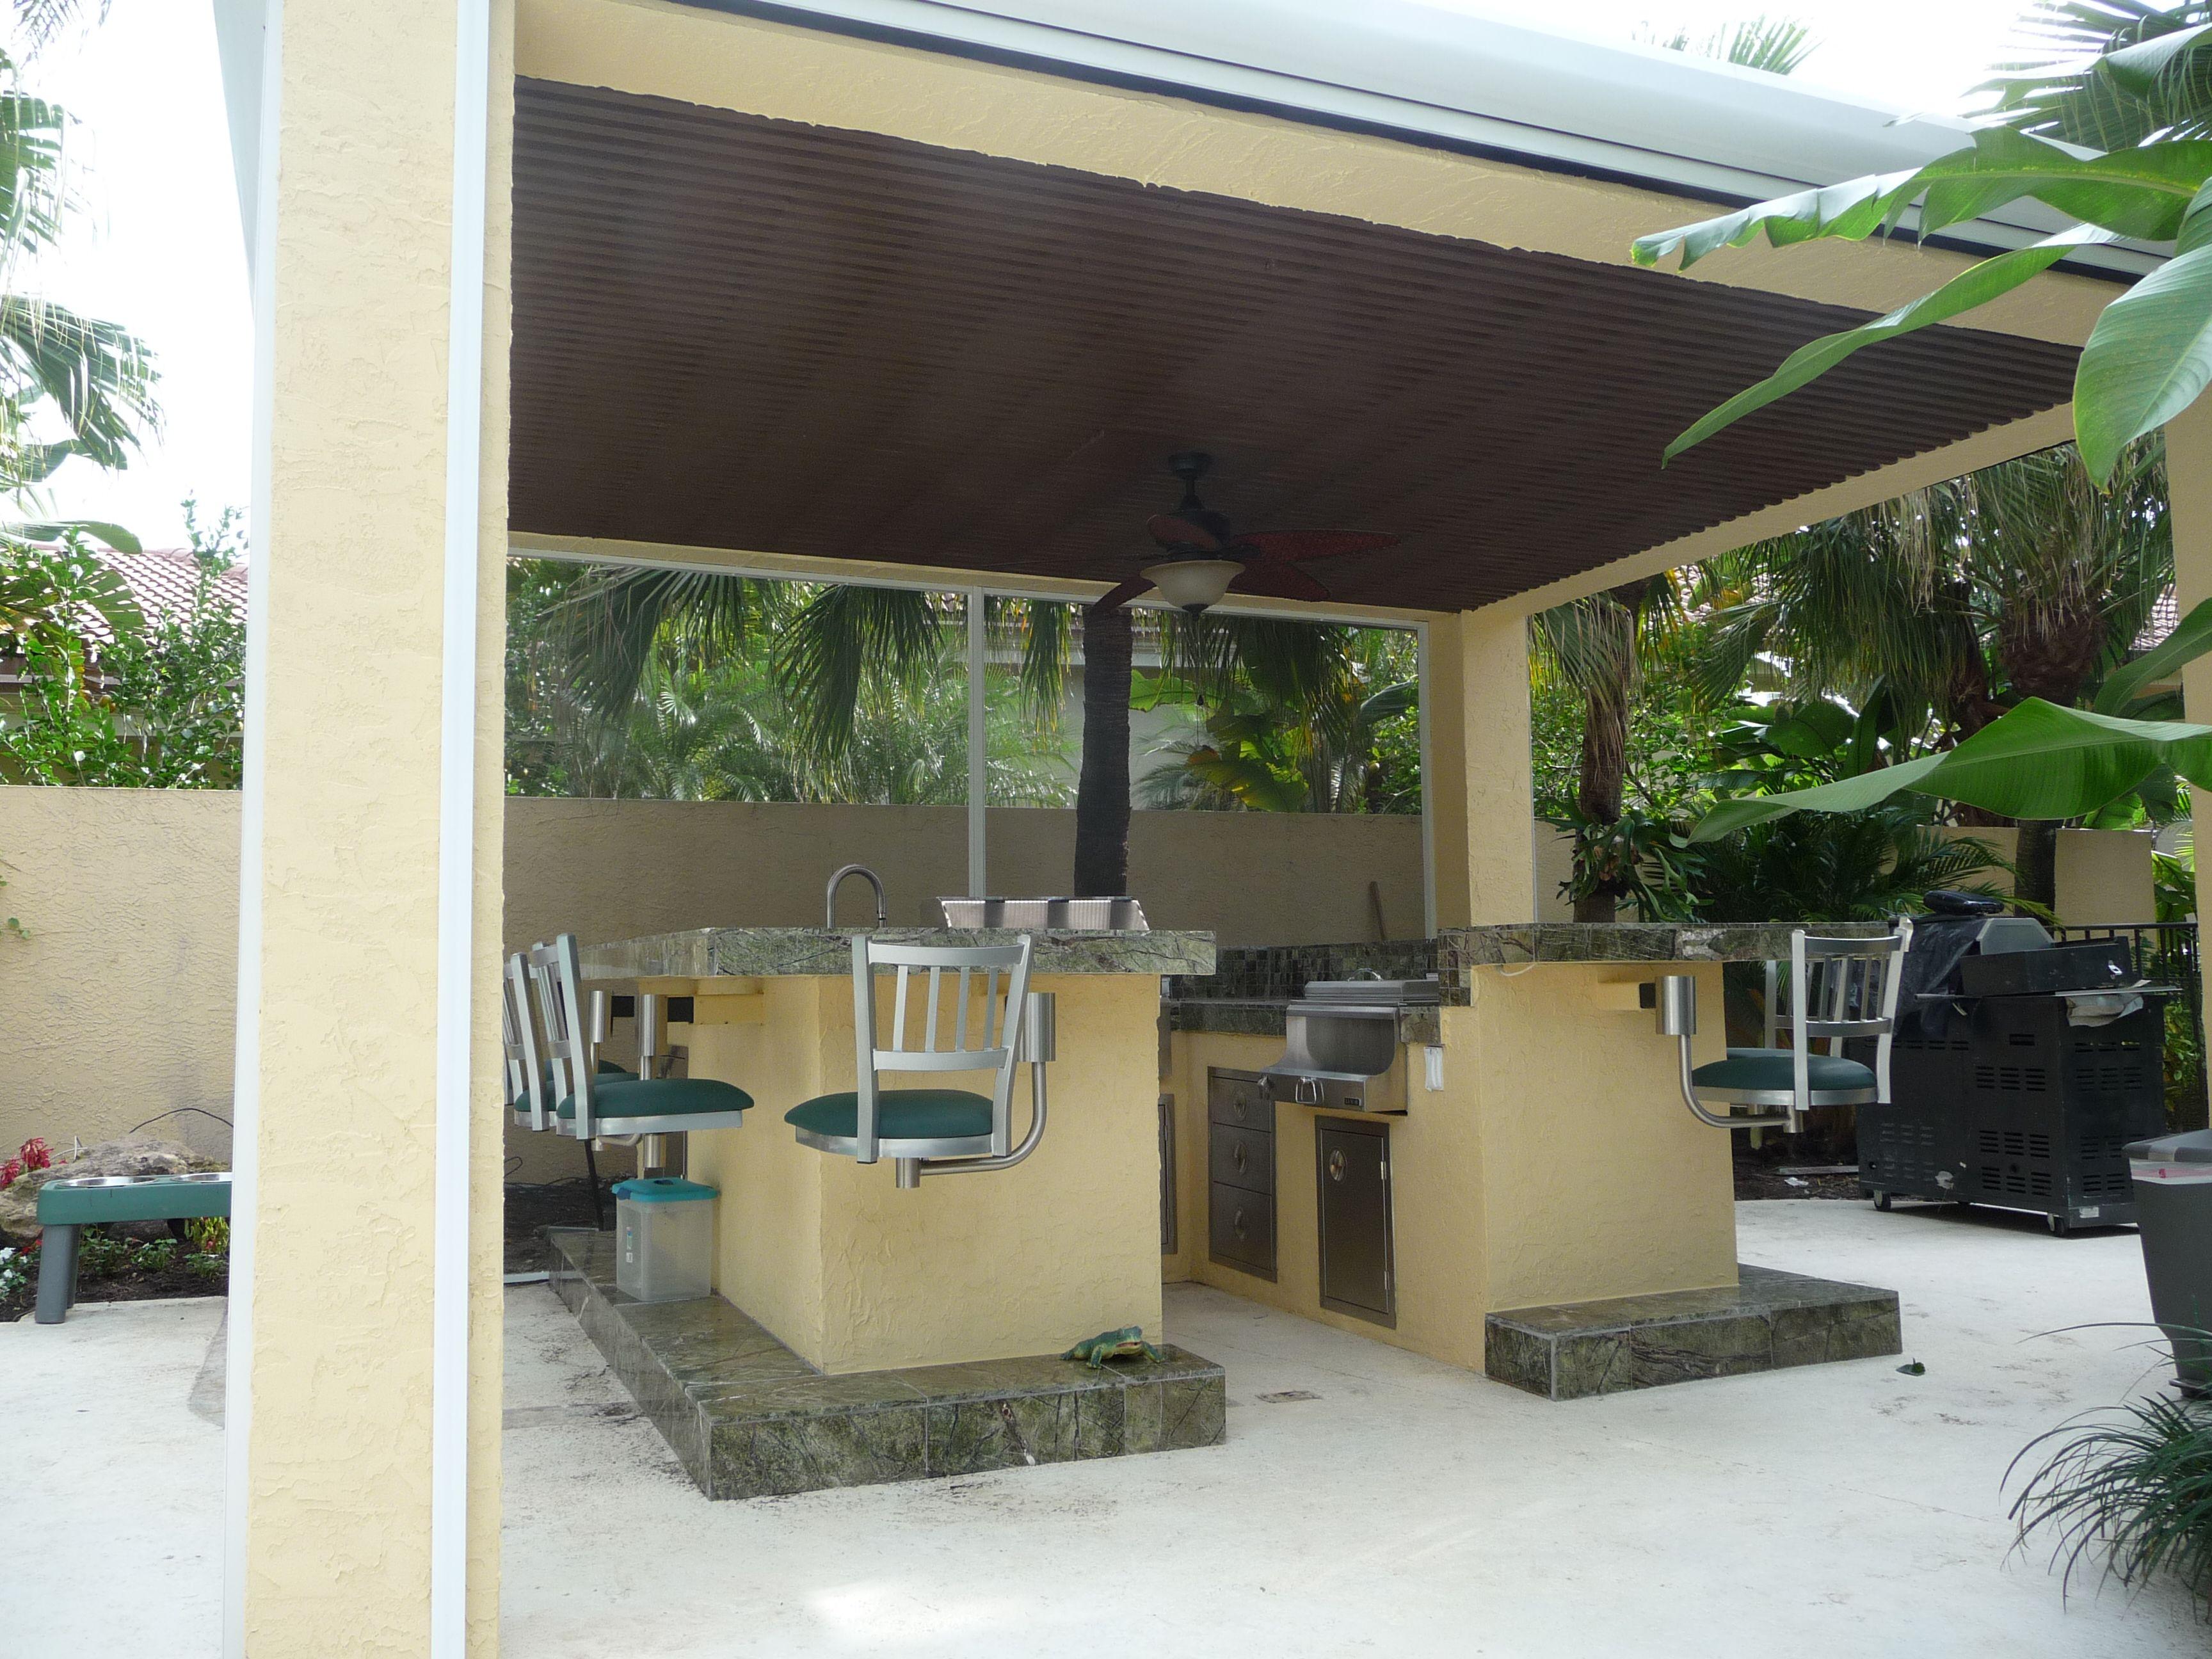 covered outdoor kitchen outdoor kitchen ideas pinterest on outdoor kitchen id=11636